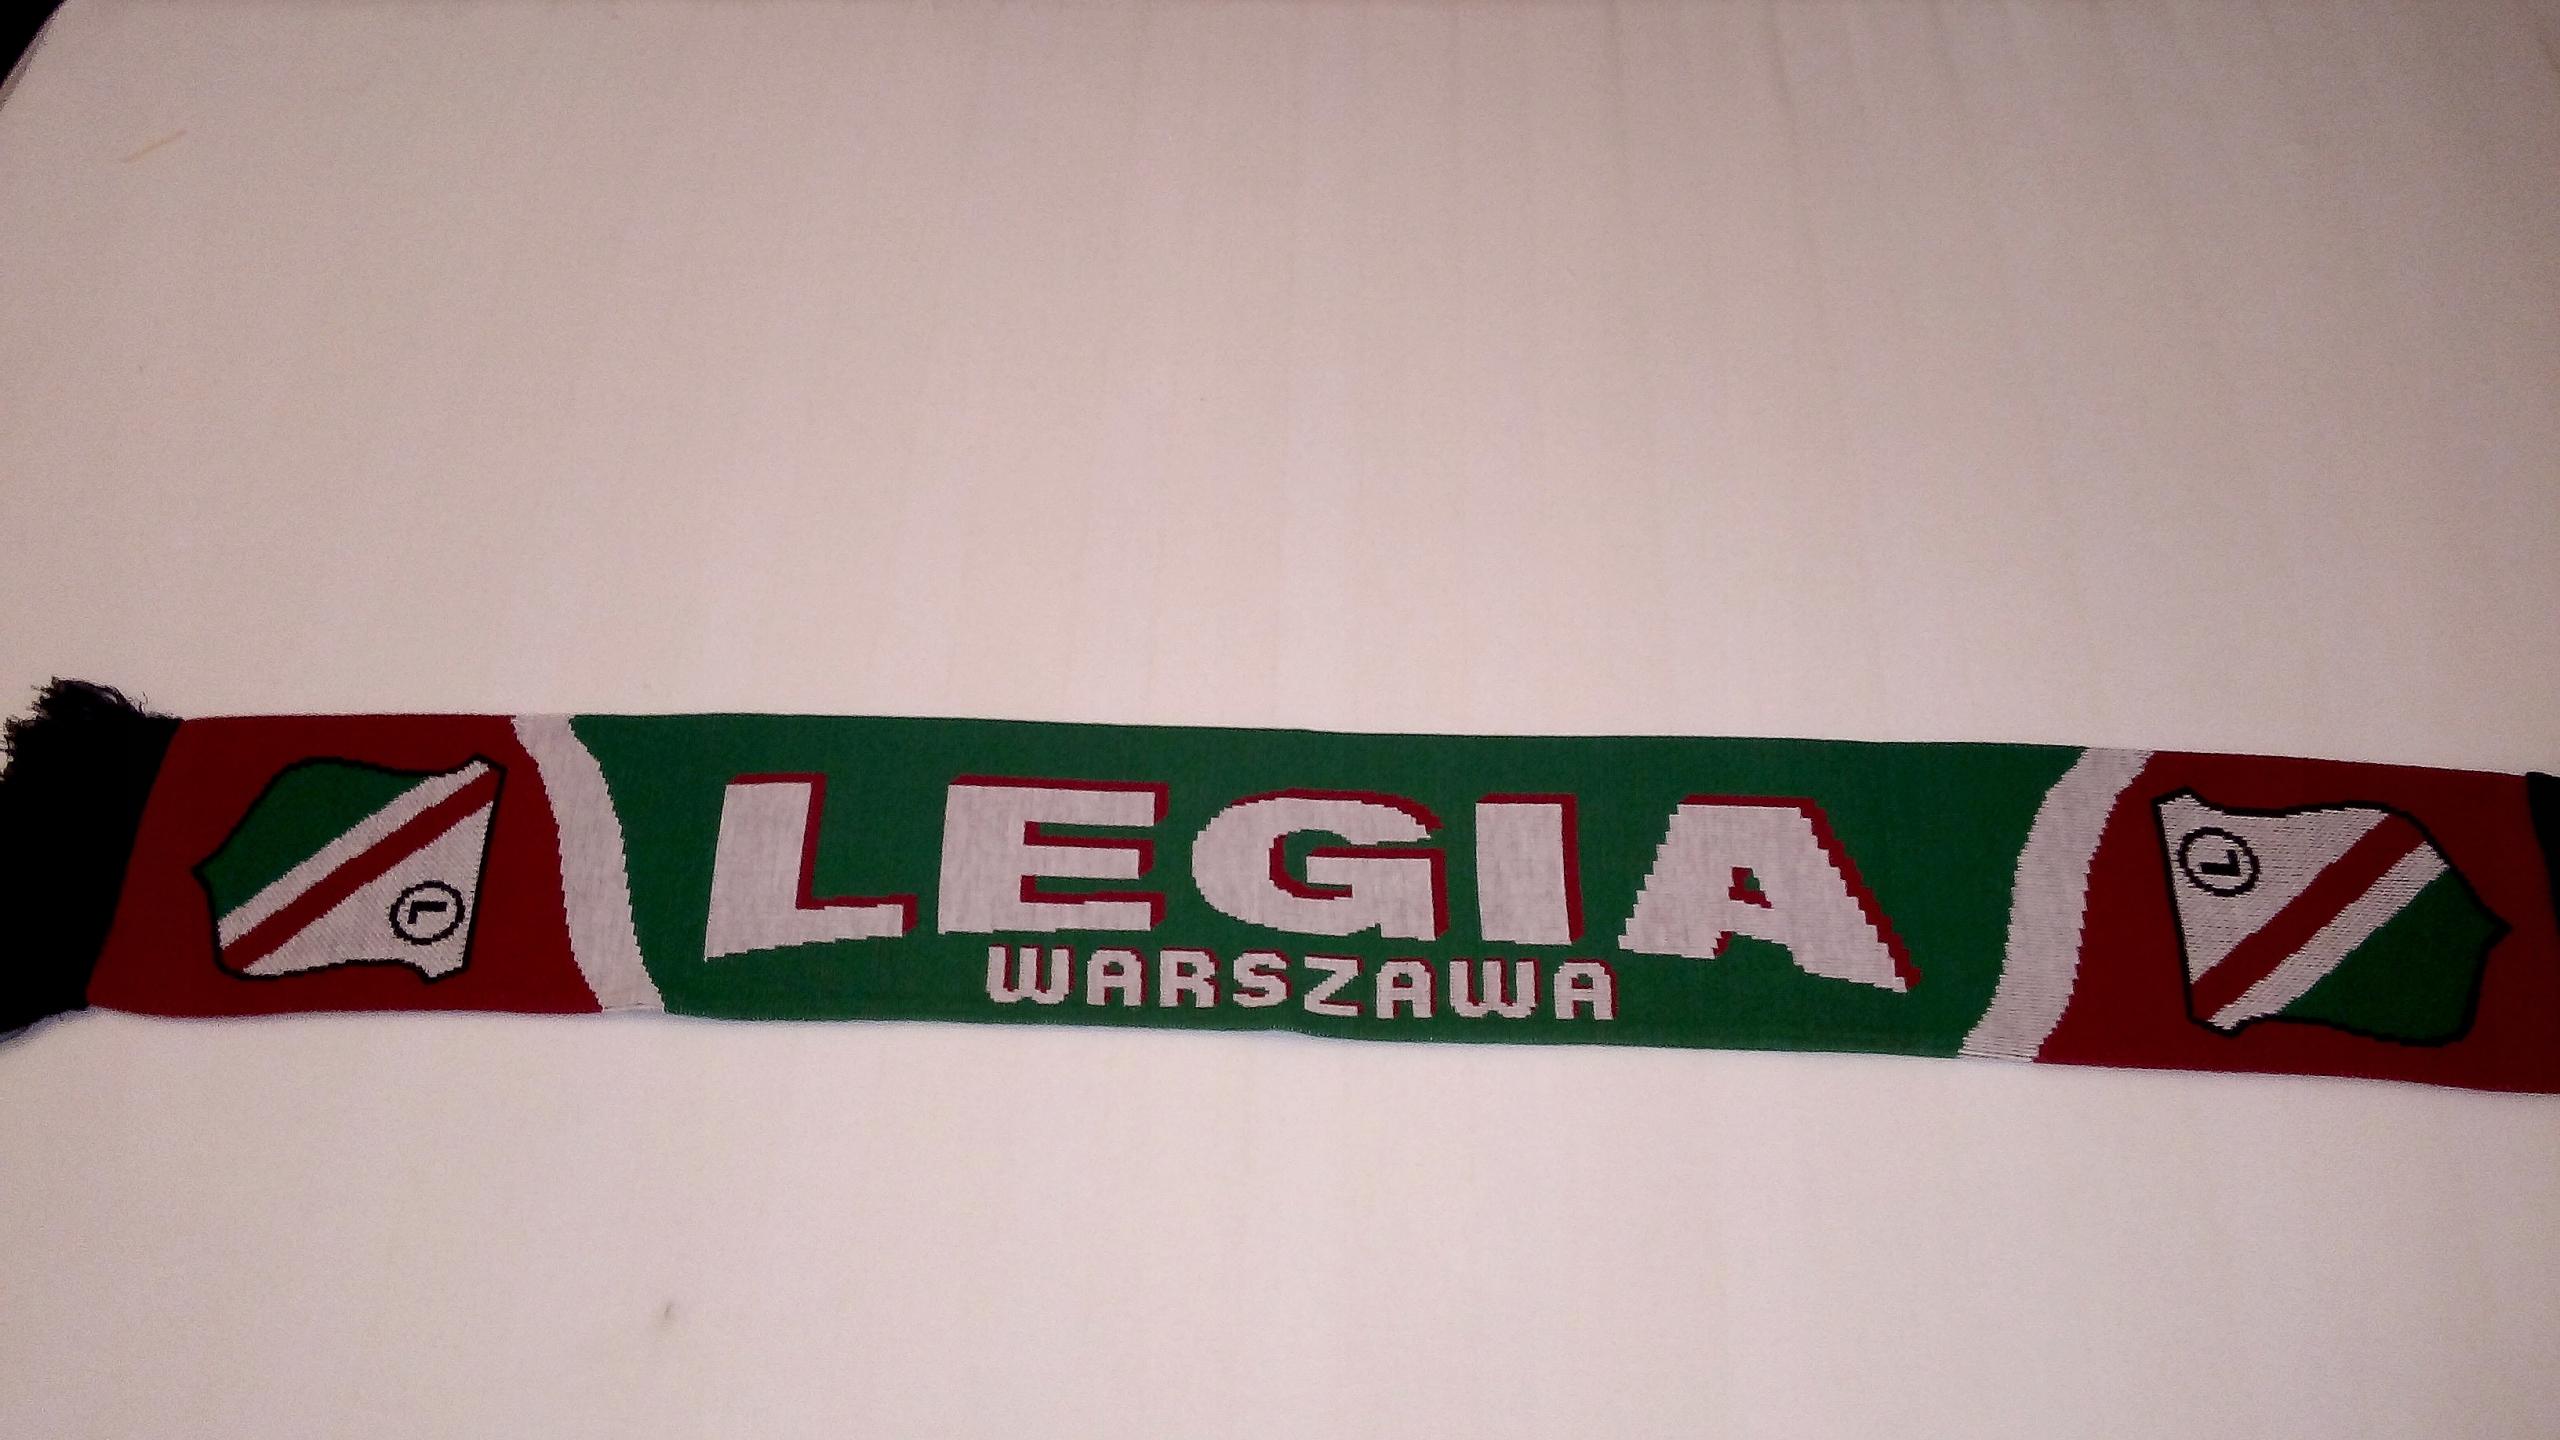 Szal Kłatika - Varšava - Bilaterálne.